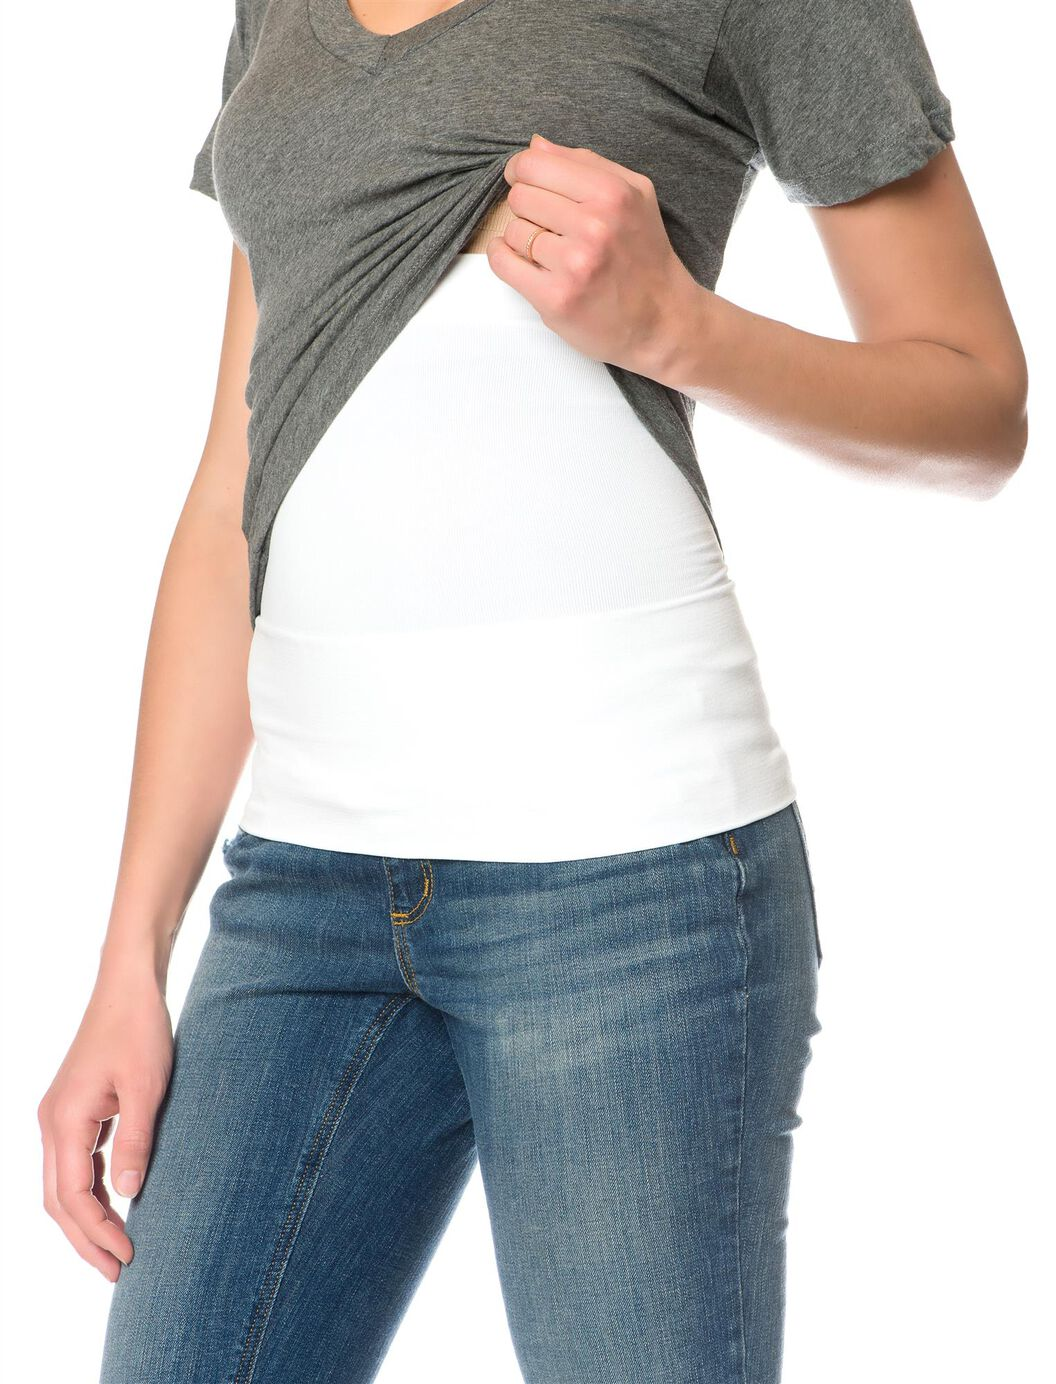 Bounceback Post Pregnancy Tummy Transformer at Motherhood Maternity in Victor, NY   Tuggl